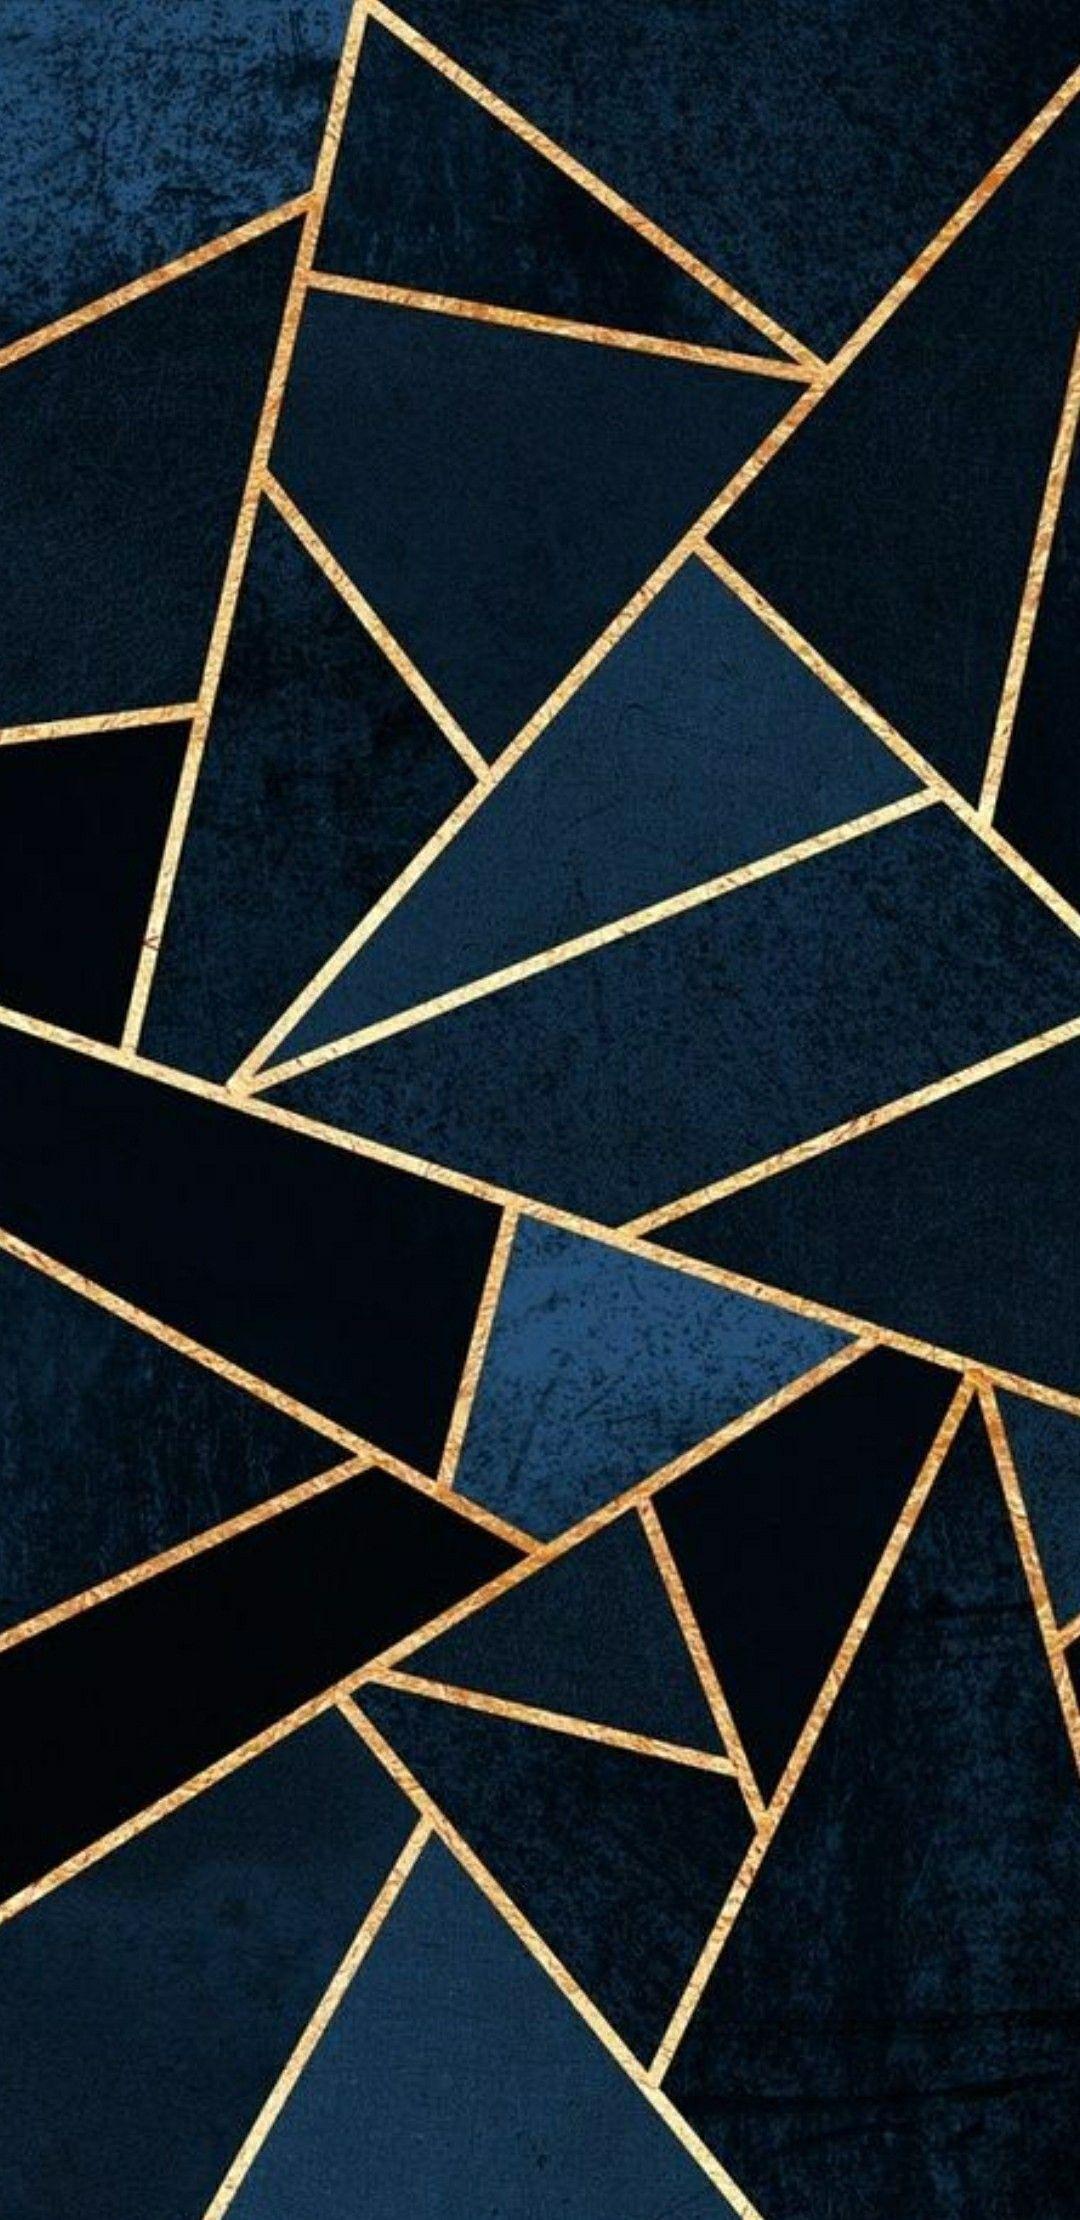 ncslorelladigiorgio | ncslorelladigiorgio | Page 2 |Masculine Blue Background